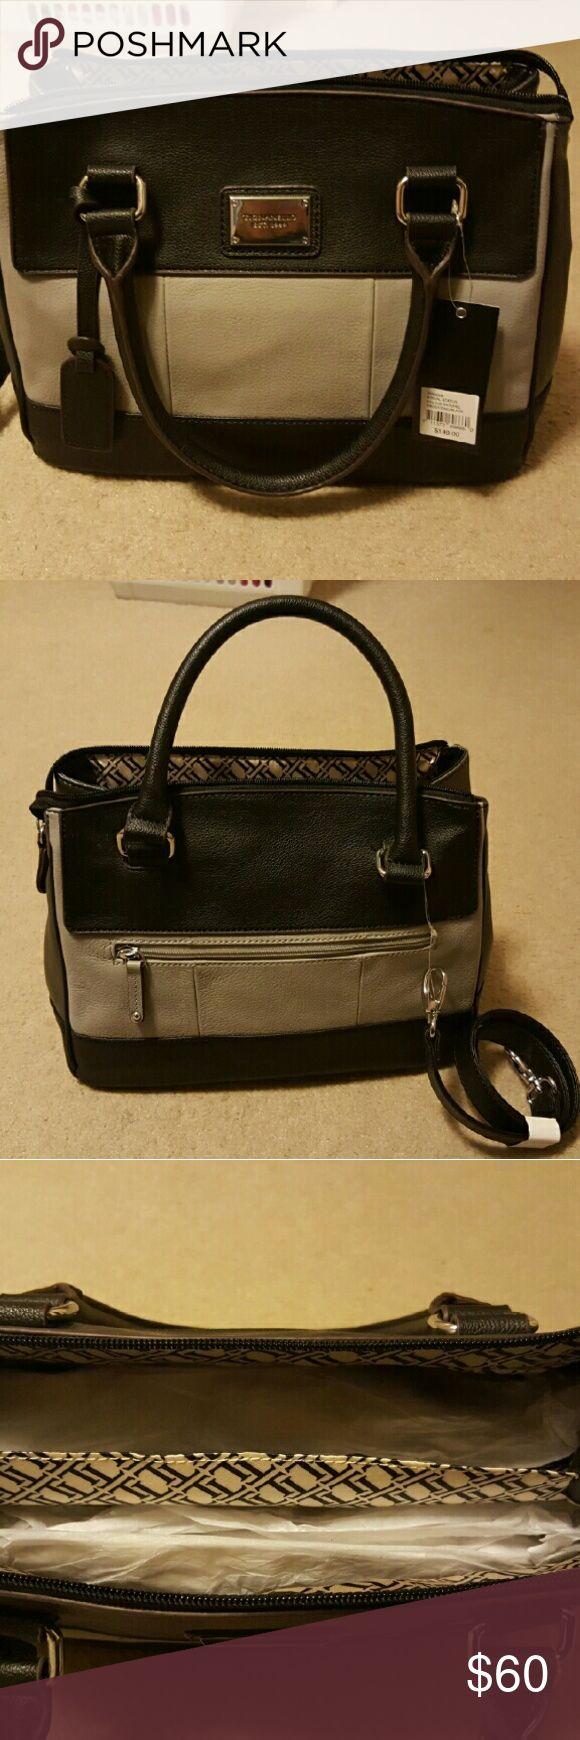 Tignanello Handbag NWT Brand new Tignanello handbag, two toned black and gray. Tignanello Bags Satchels